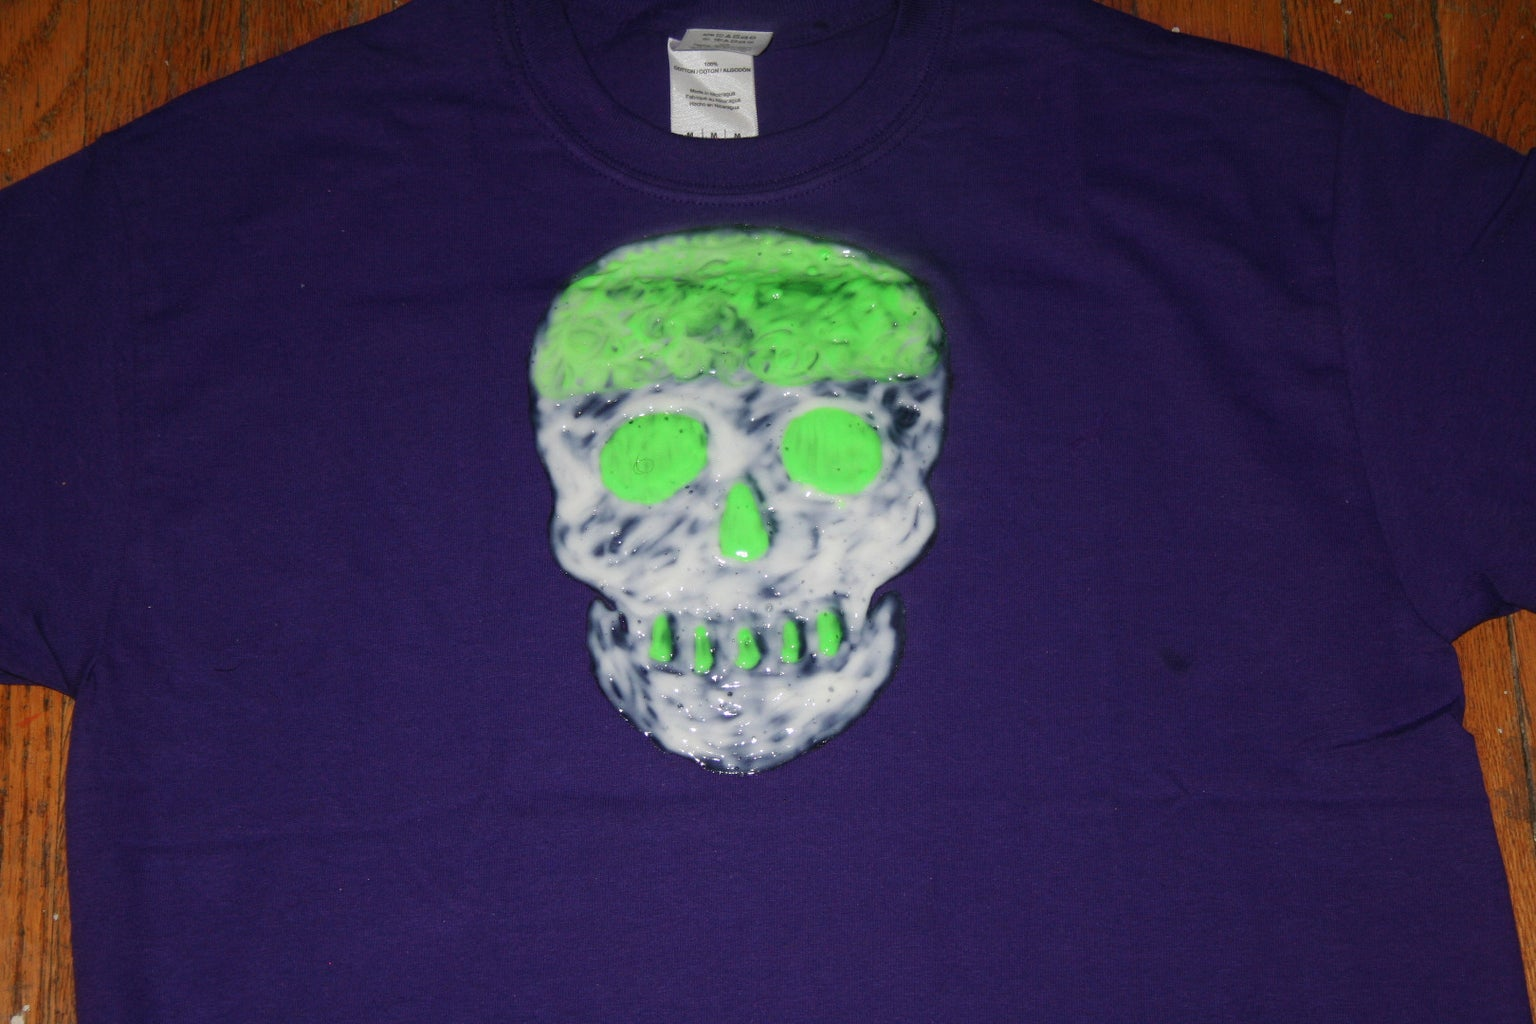 3D Glow-in-the-Dark Skull T-Shirt